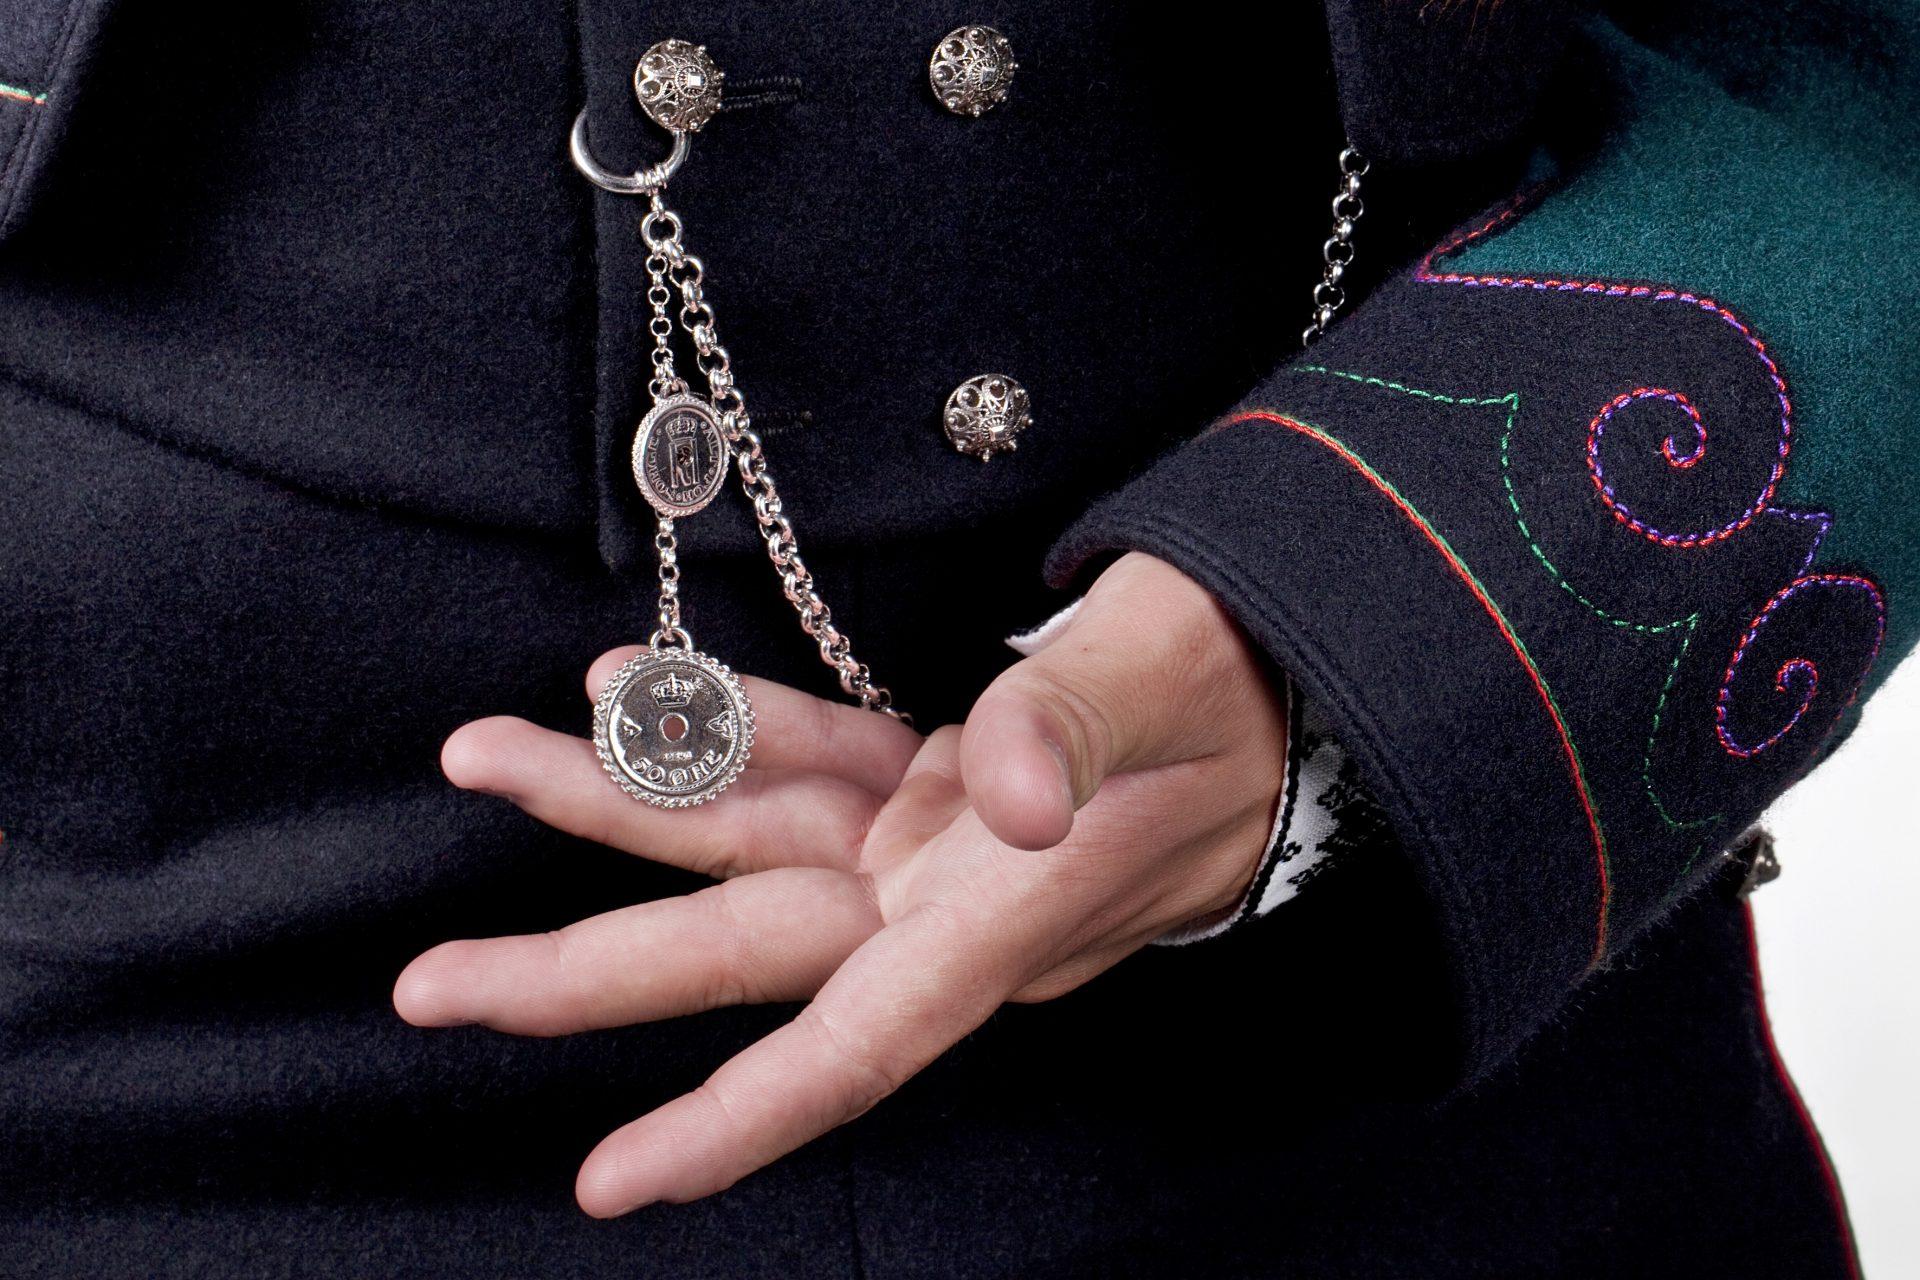 Almankås Klokkeband Øst-Telemark herrebunad